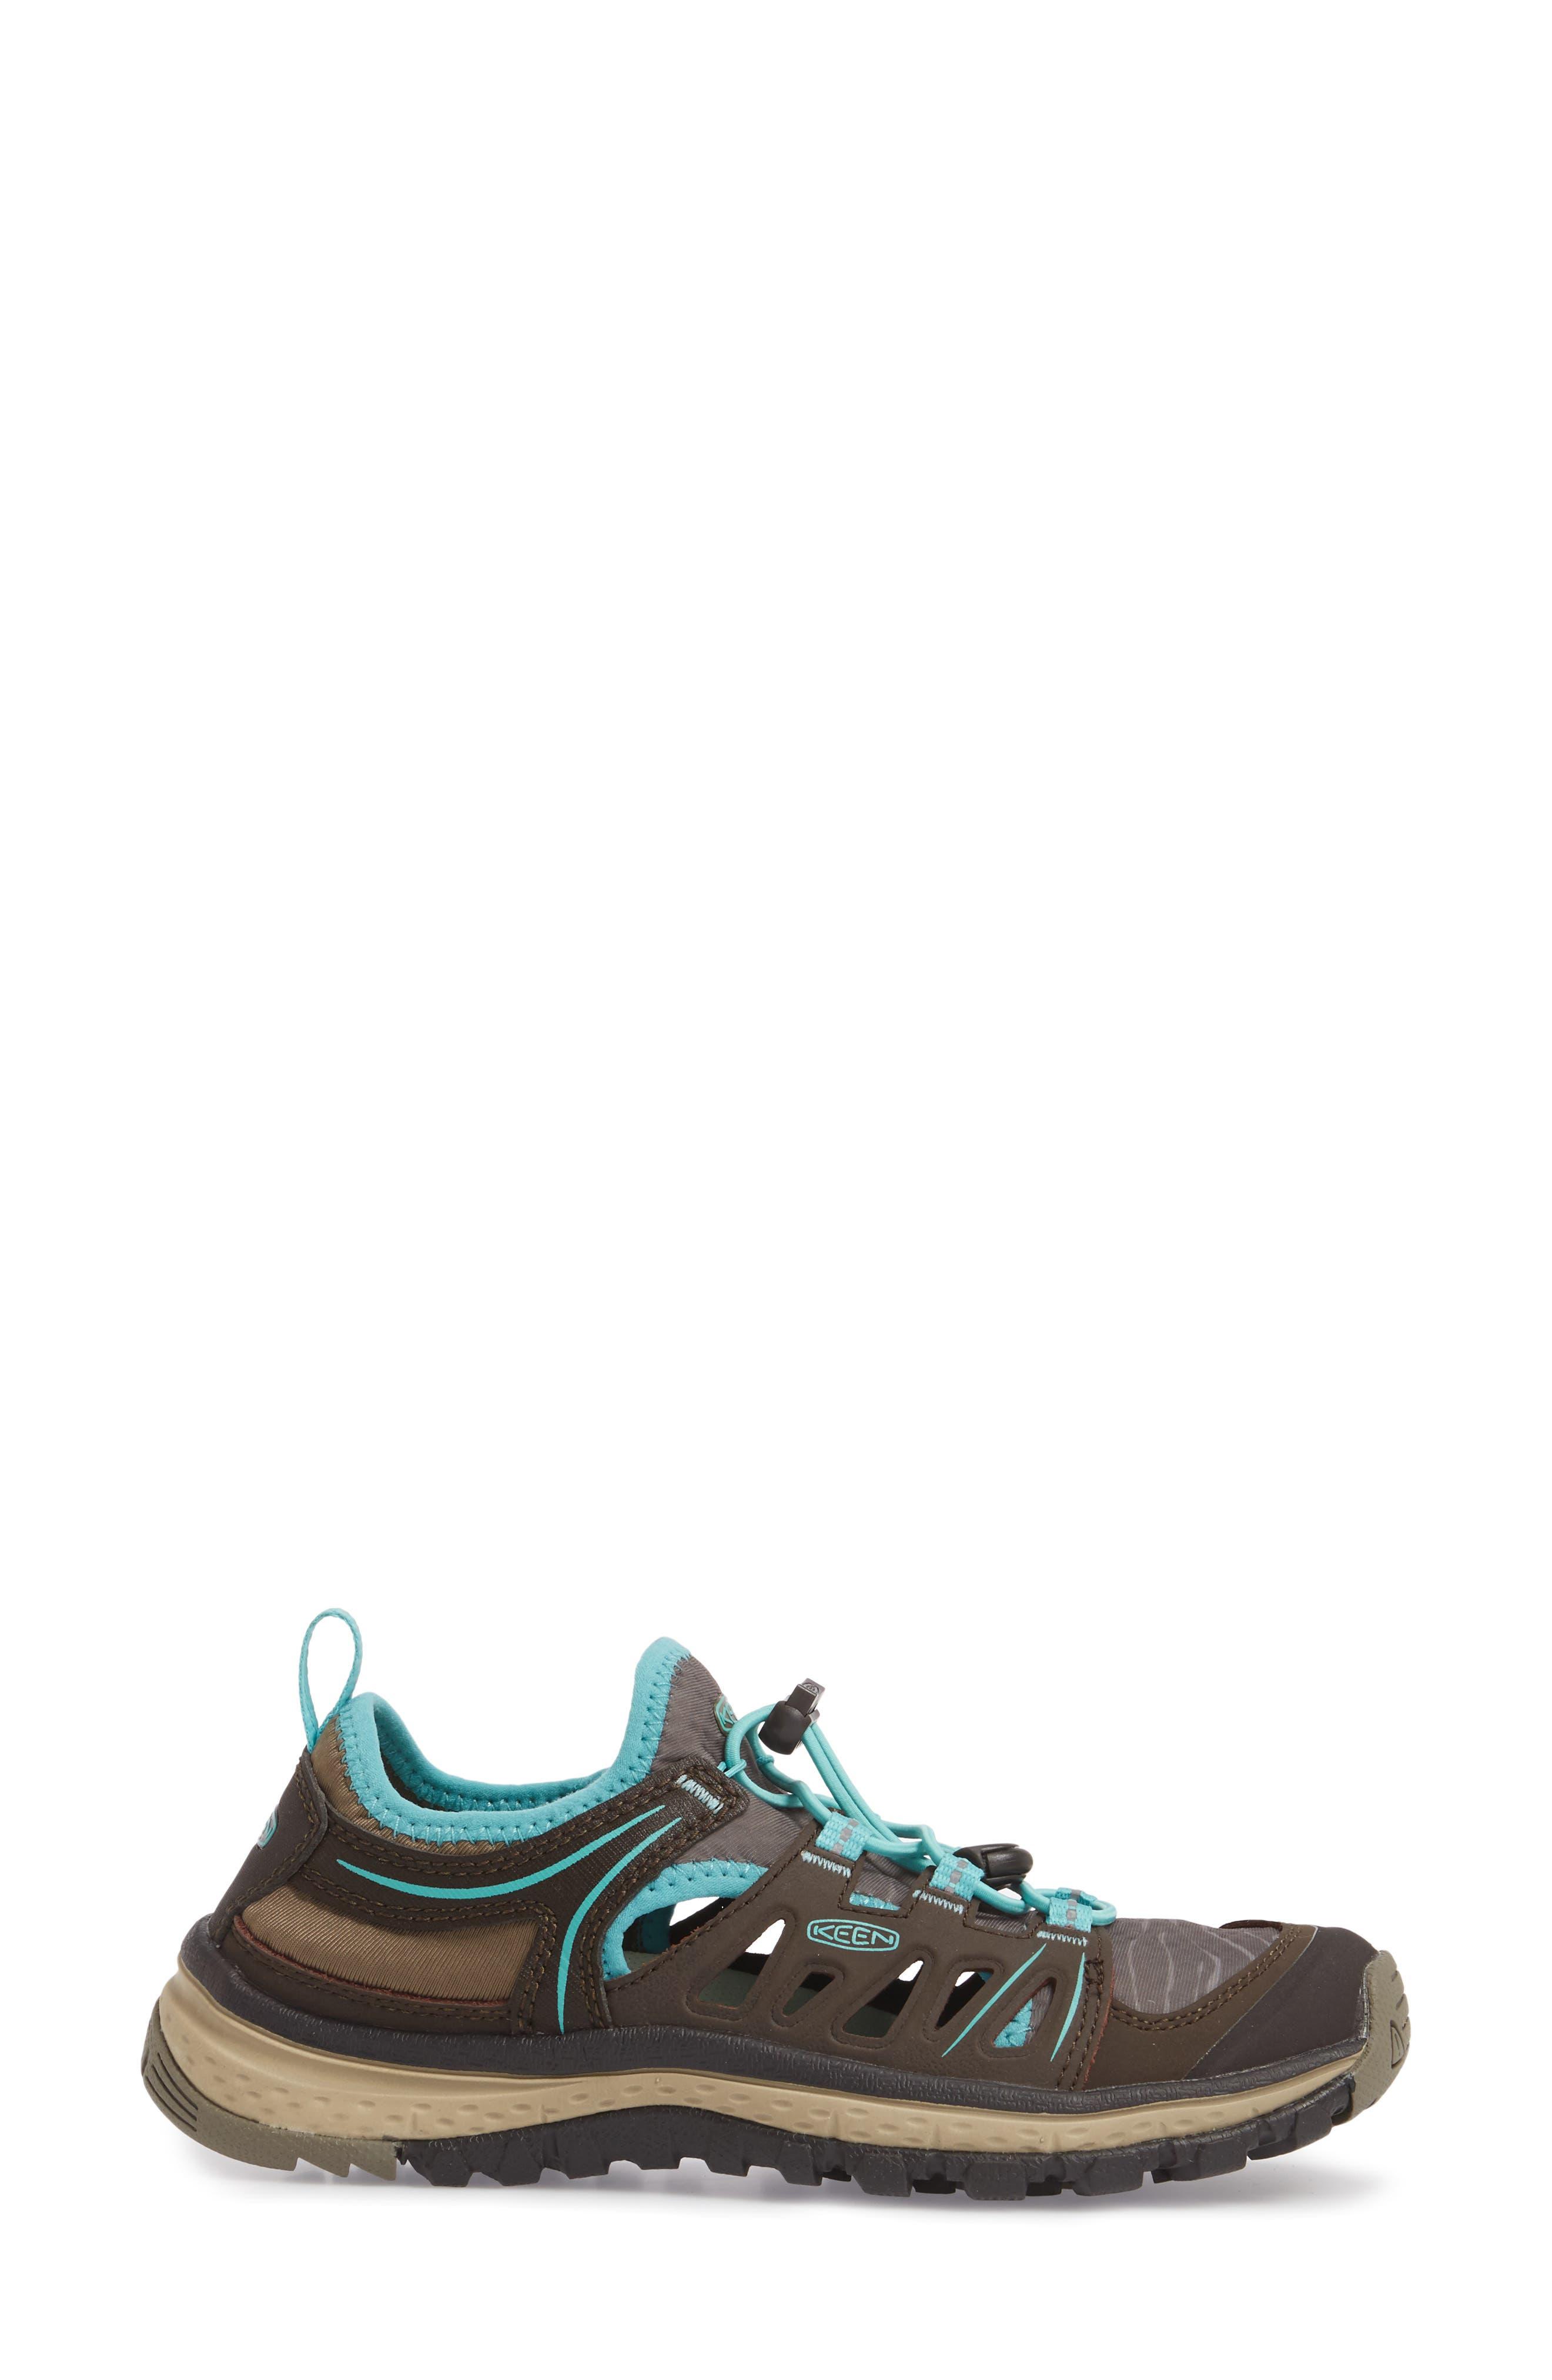 Terradora Ethos Hiking Sneaker,                             Alternate thumbnail 8, color,